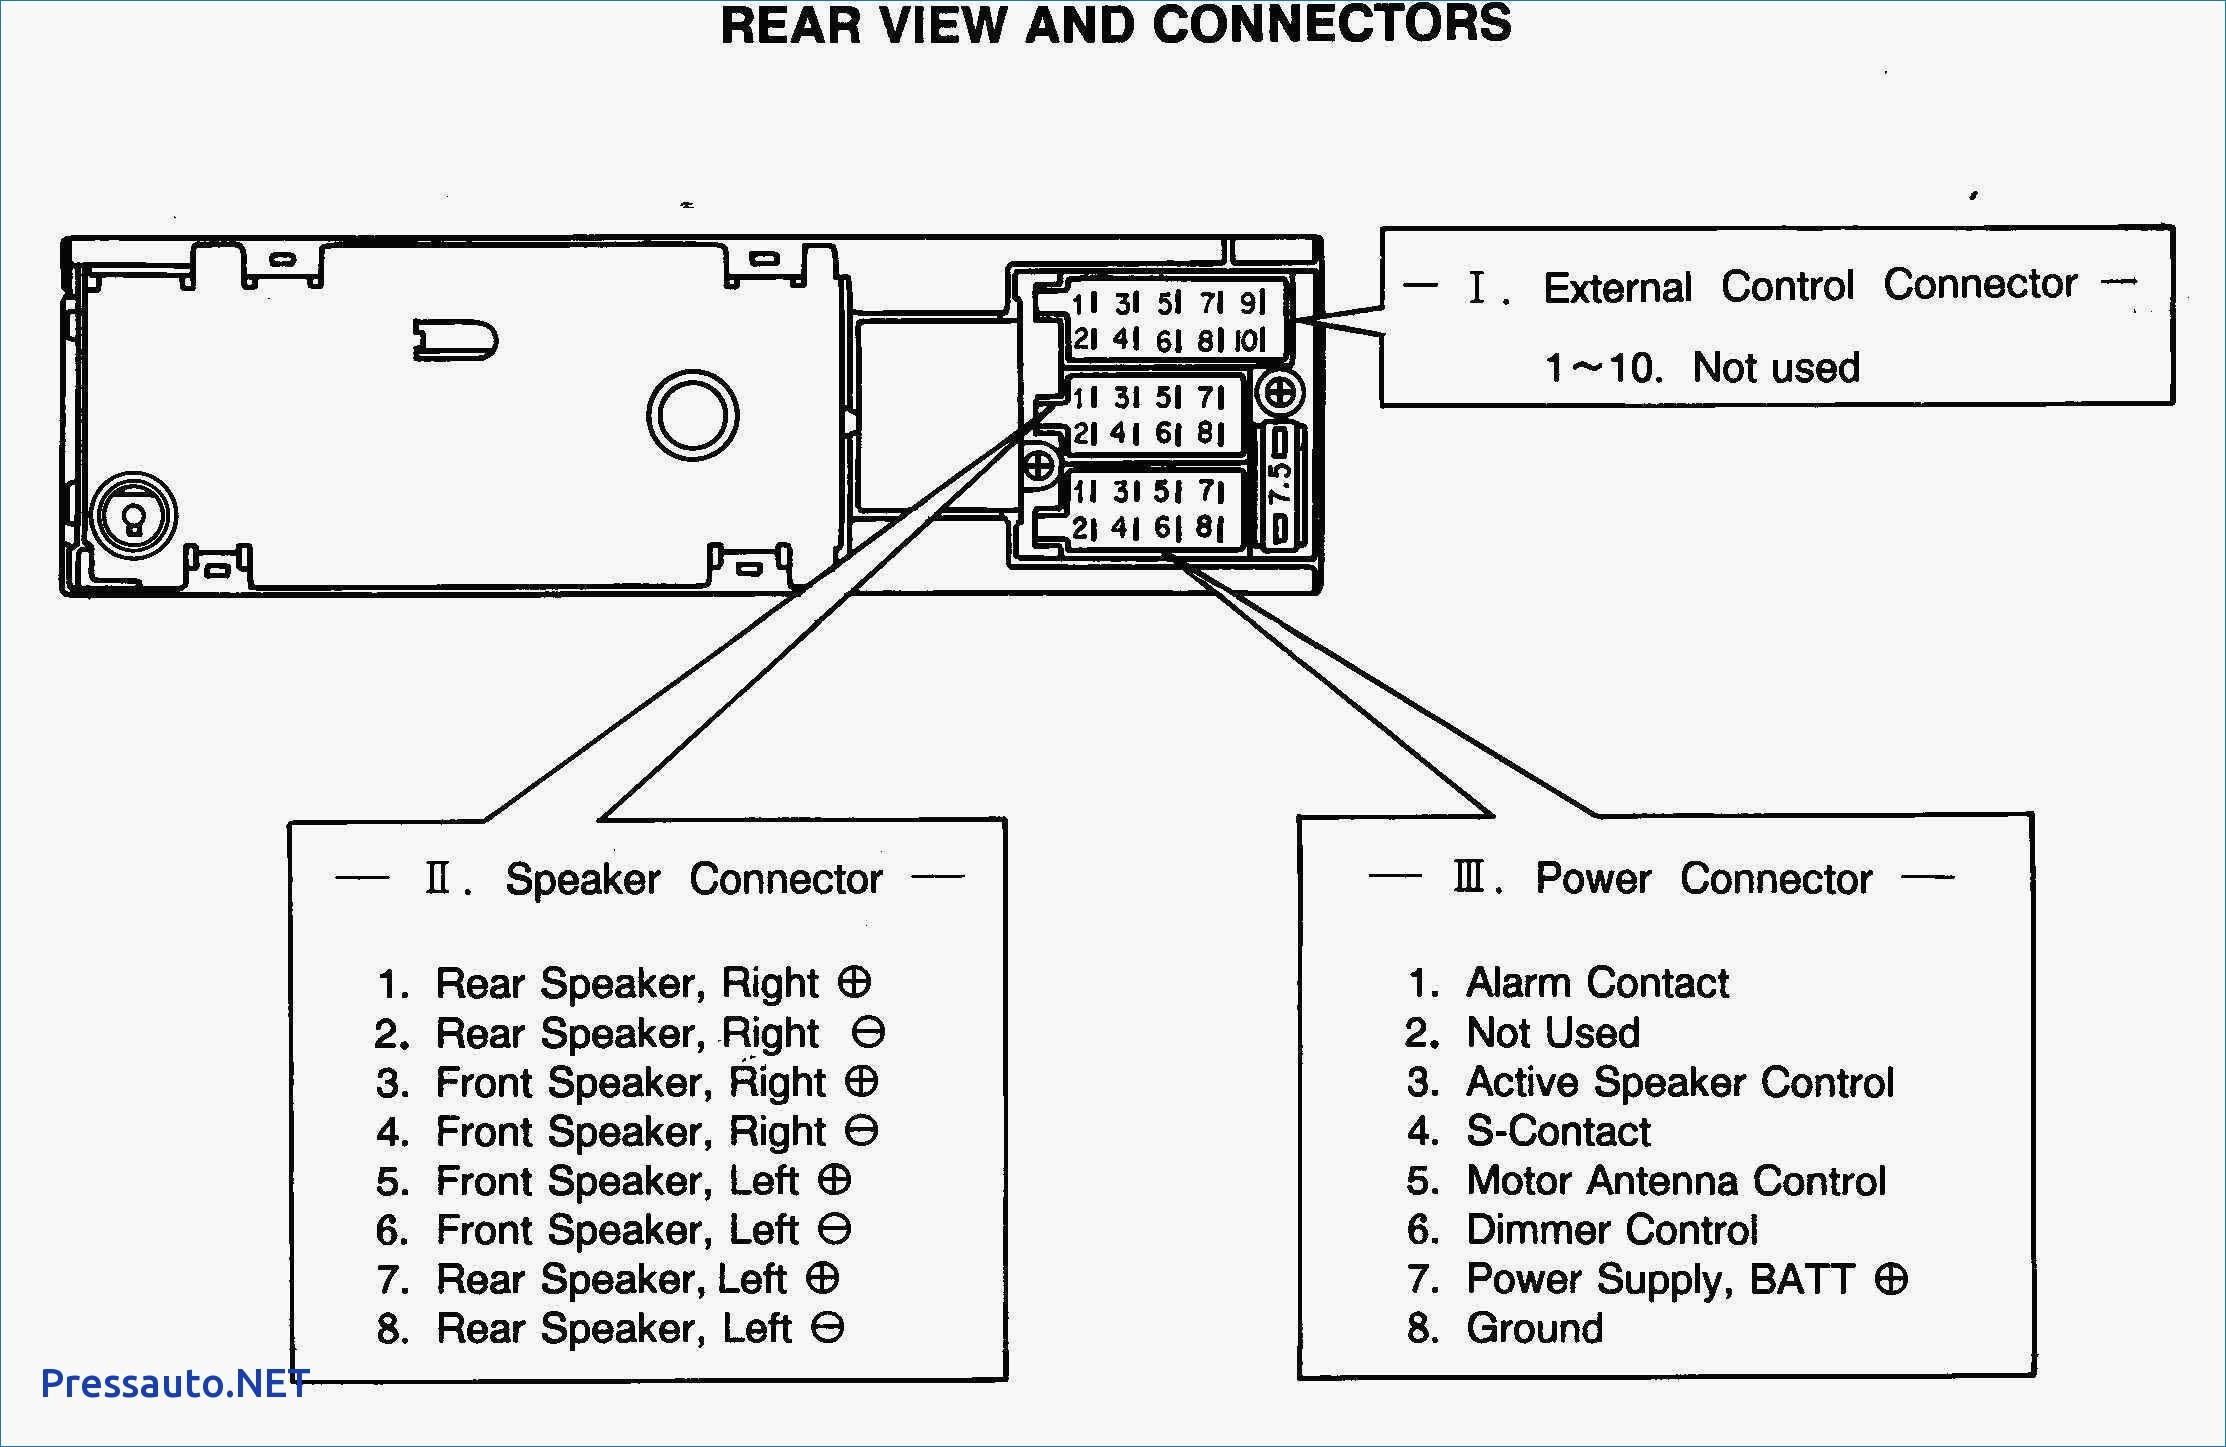 Aftermarket Radio Wiring Diagram Lovely Wiring Diagram Kenwood Car Radio Wiring Diagram Jeep Grand